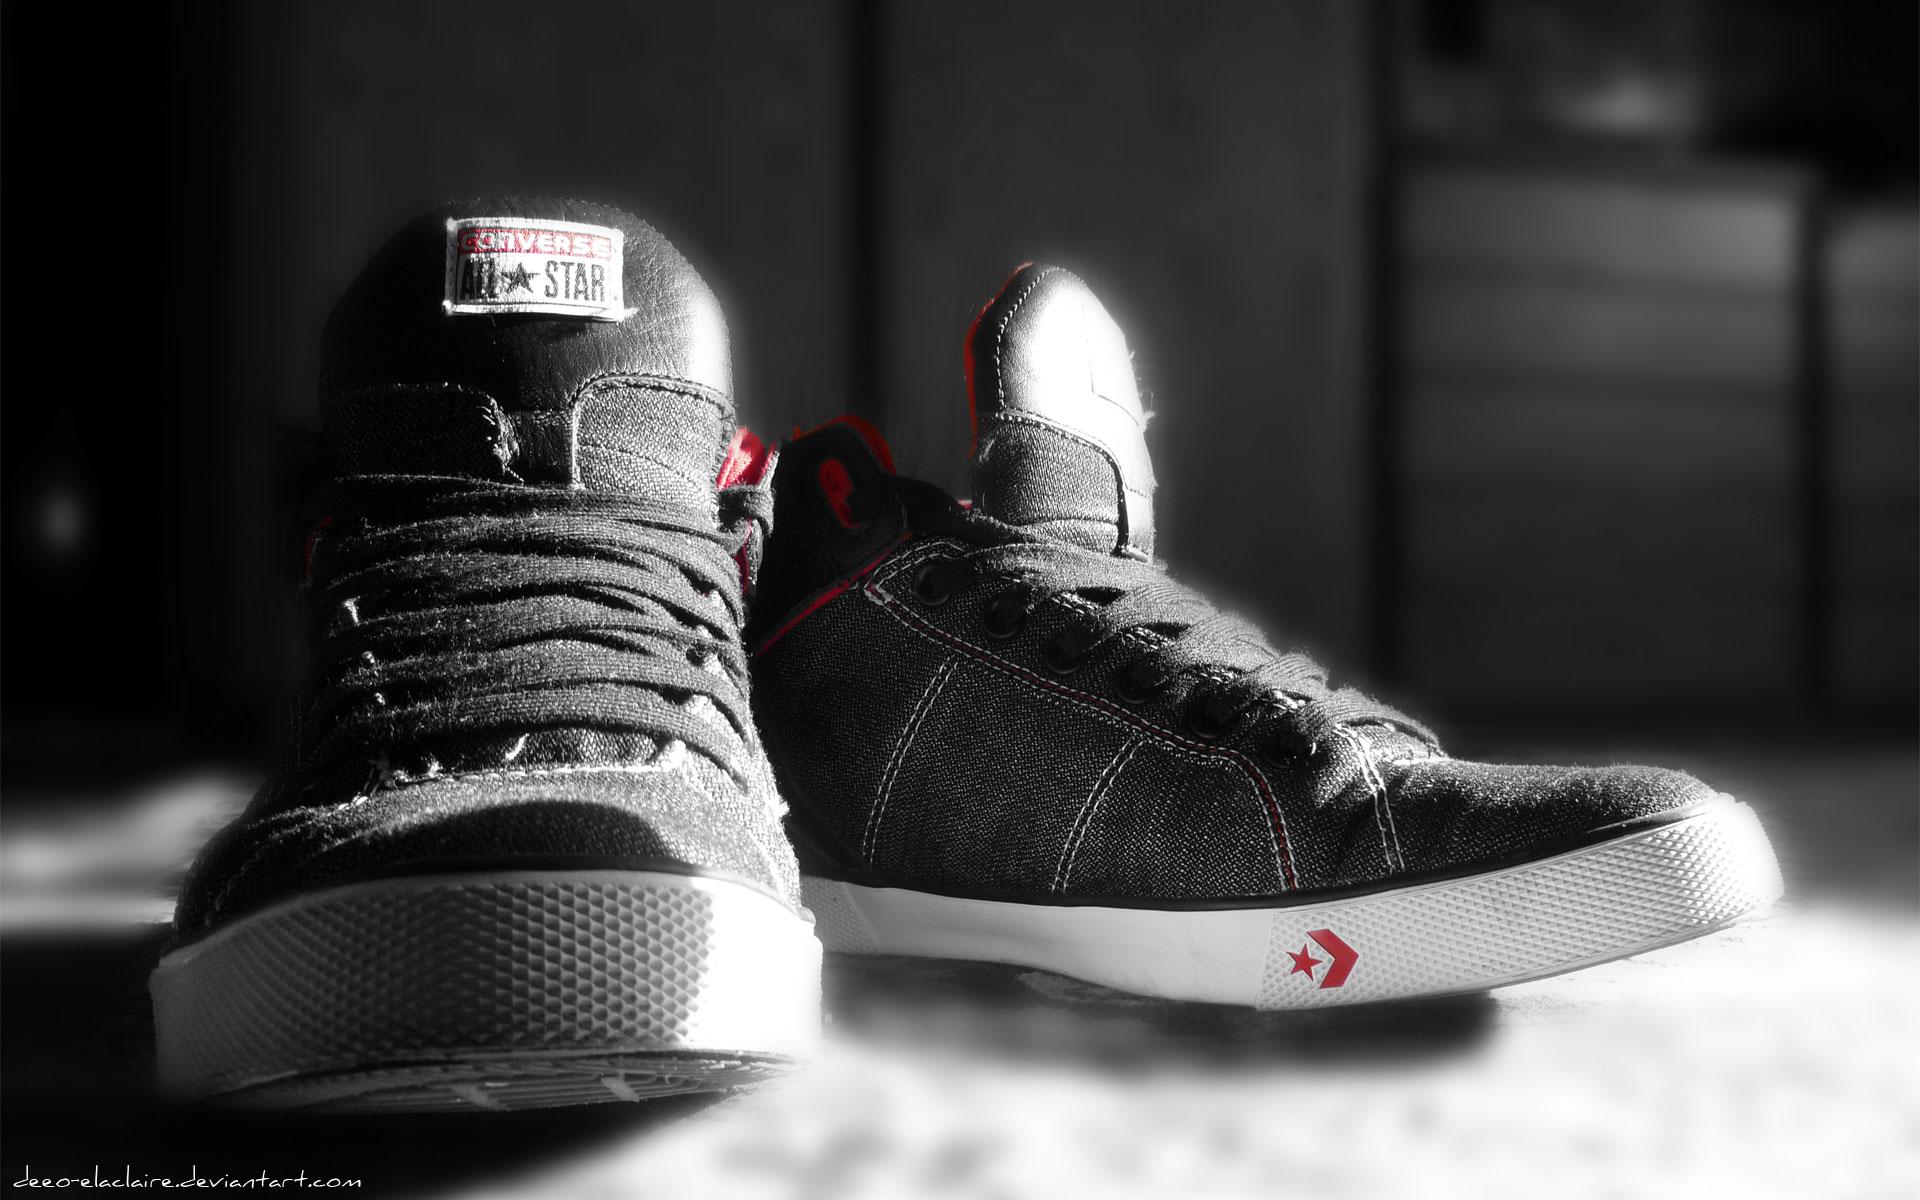 Wallpaper with Shoes - WallpaperSafari